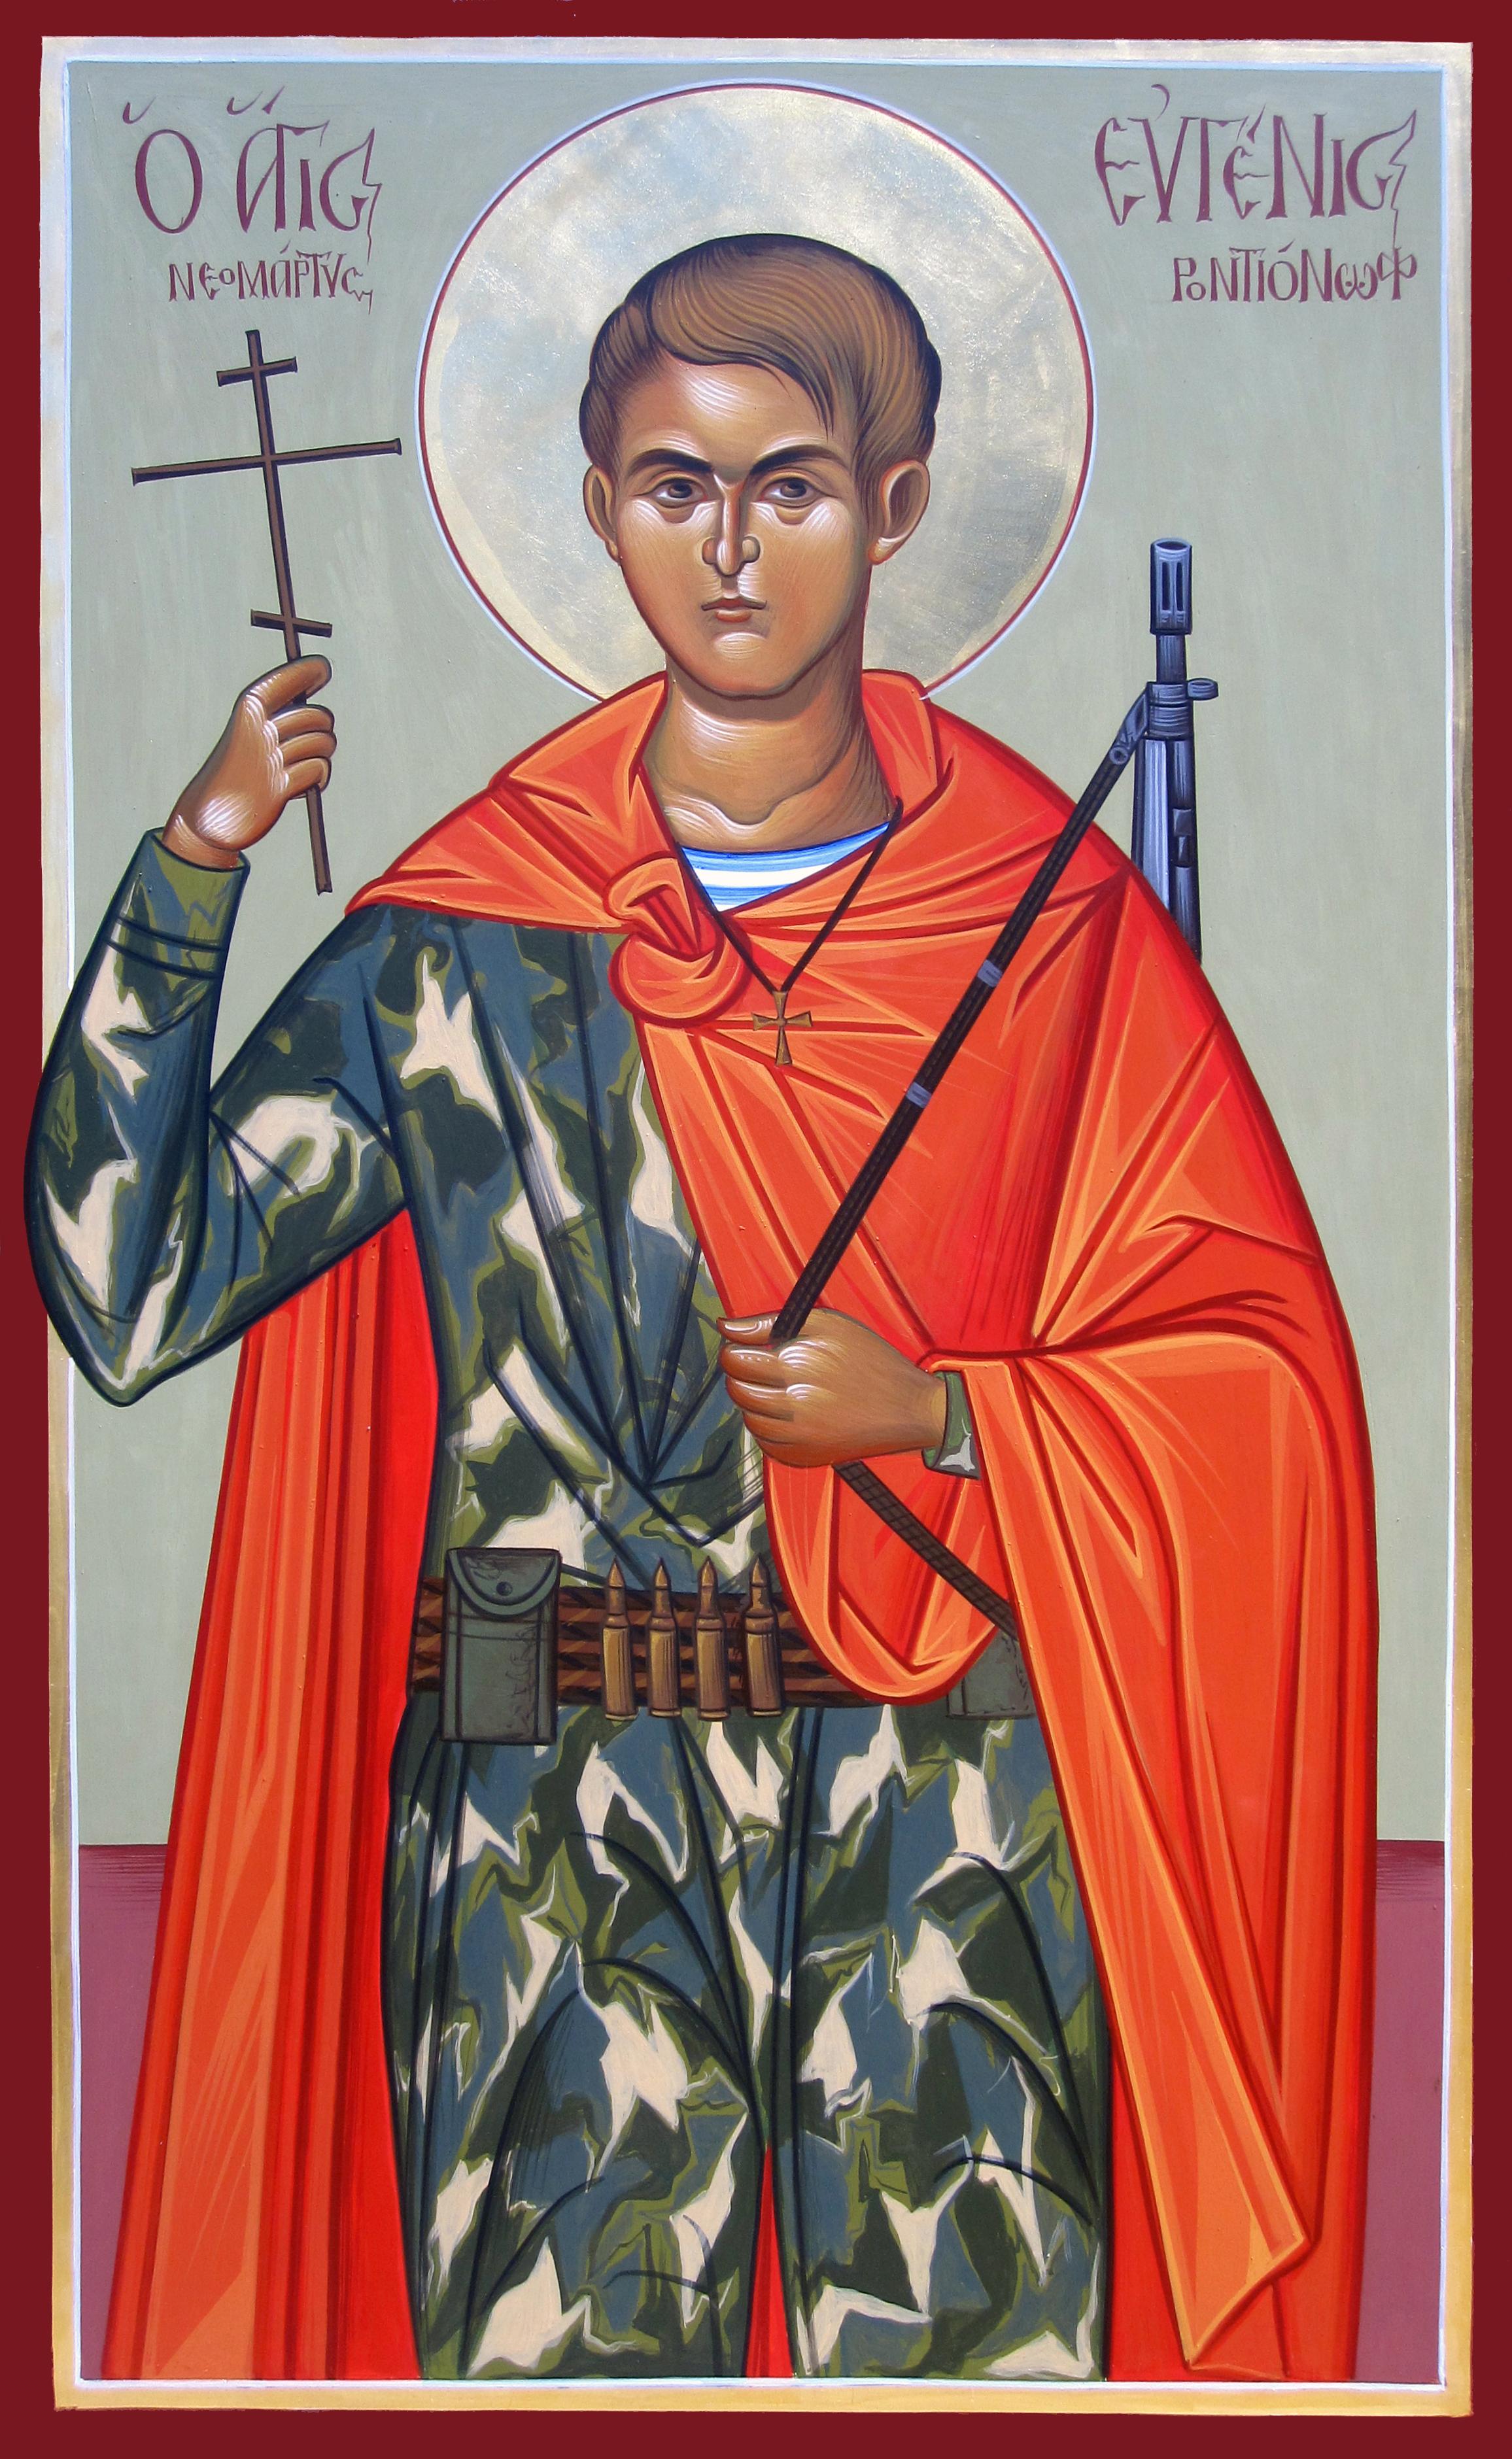 Рядовой Евгений Родионов, Ο Άγιος Νεομάρτυρας Ευγένιος Ροντιόνωφ; Saint Evgeny Rodionov the New Martyr